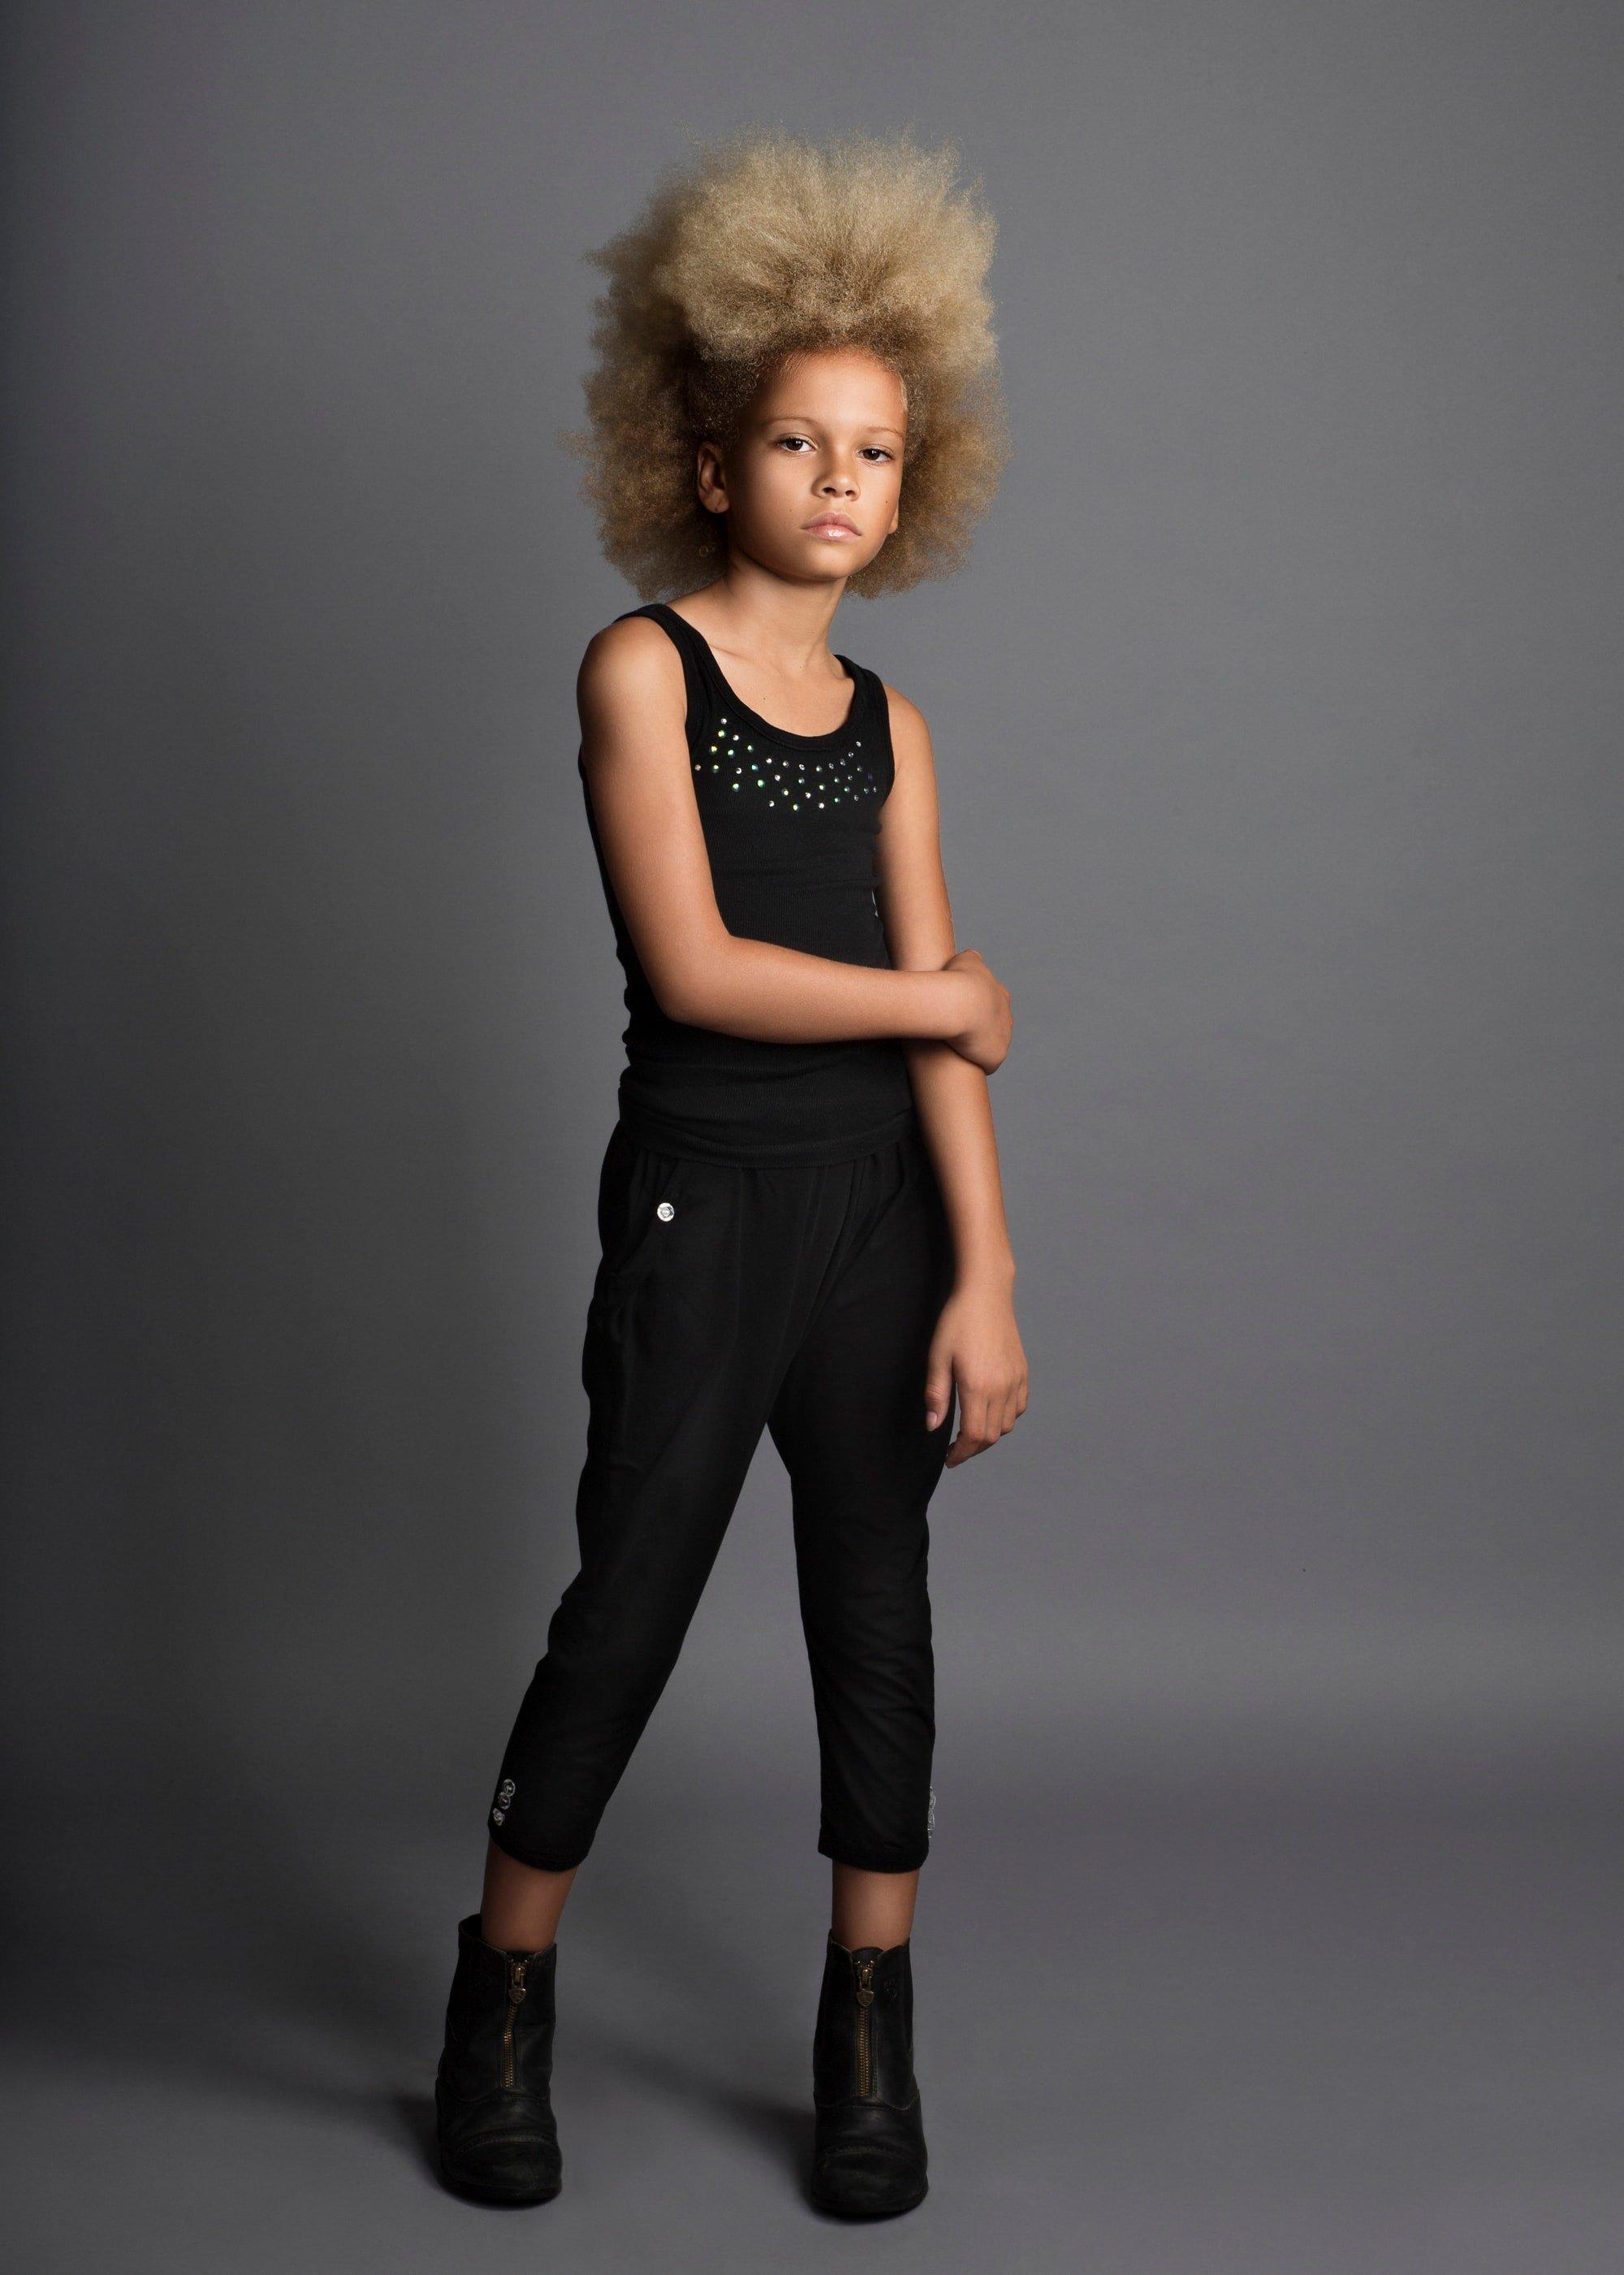 child model studio